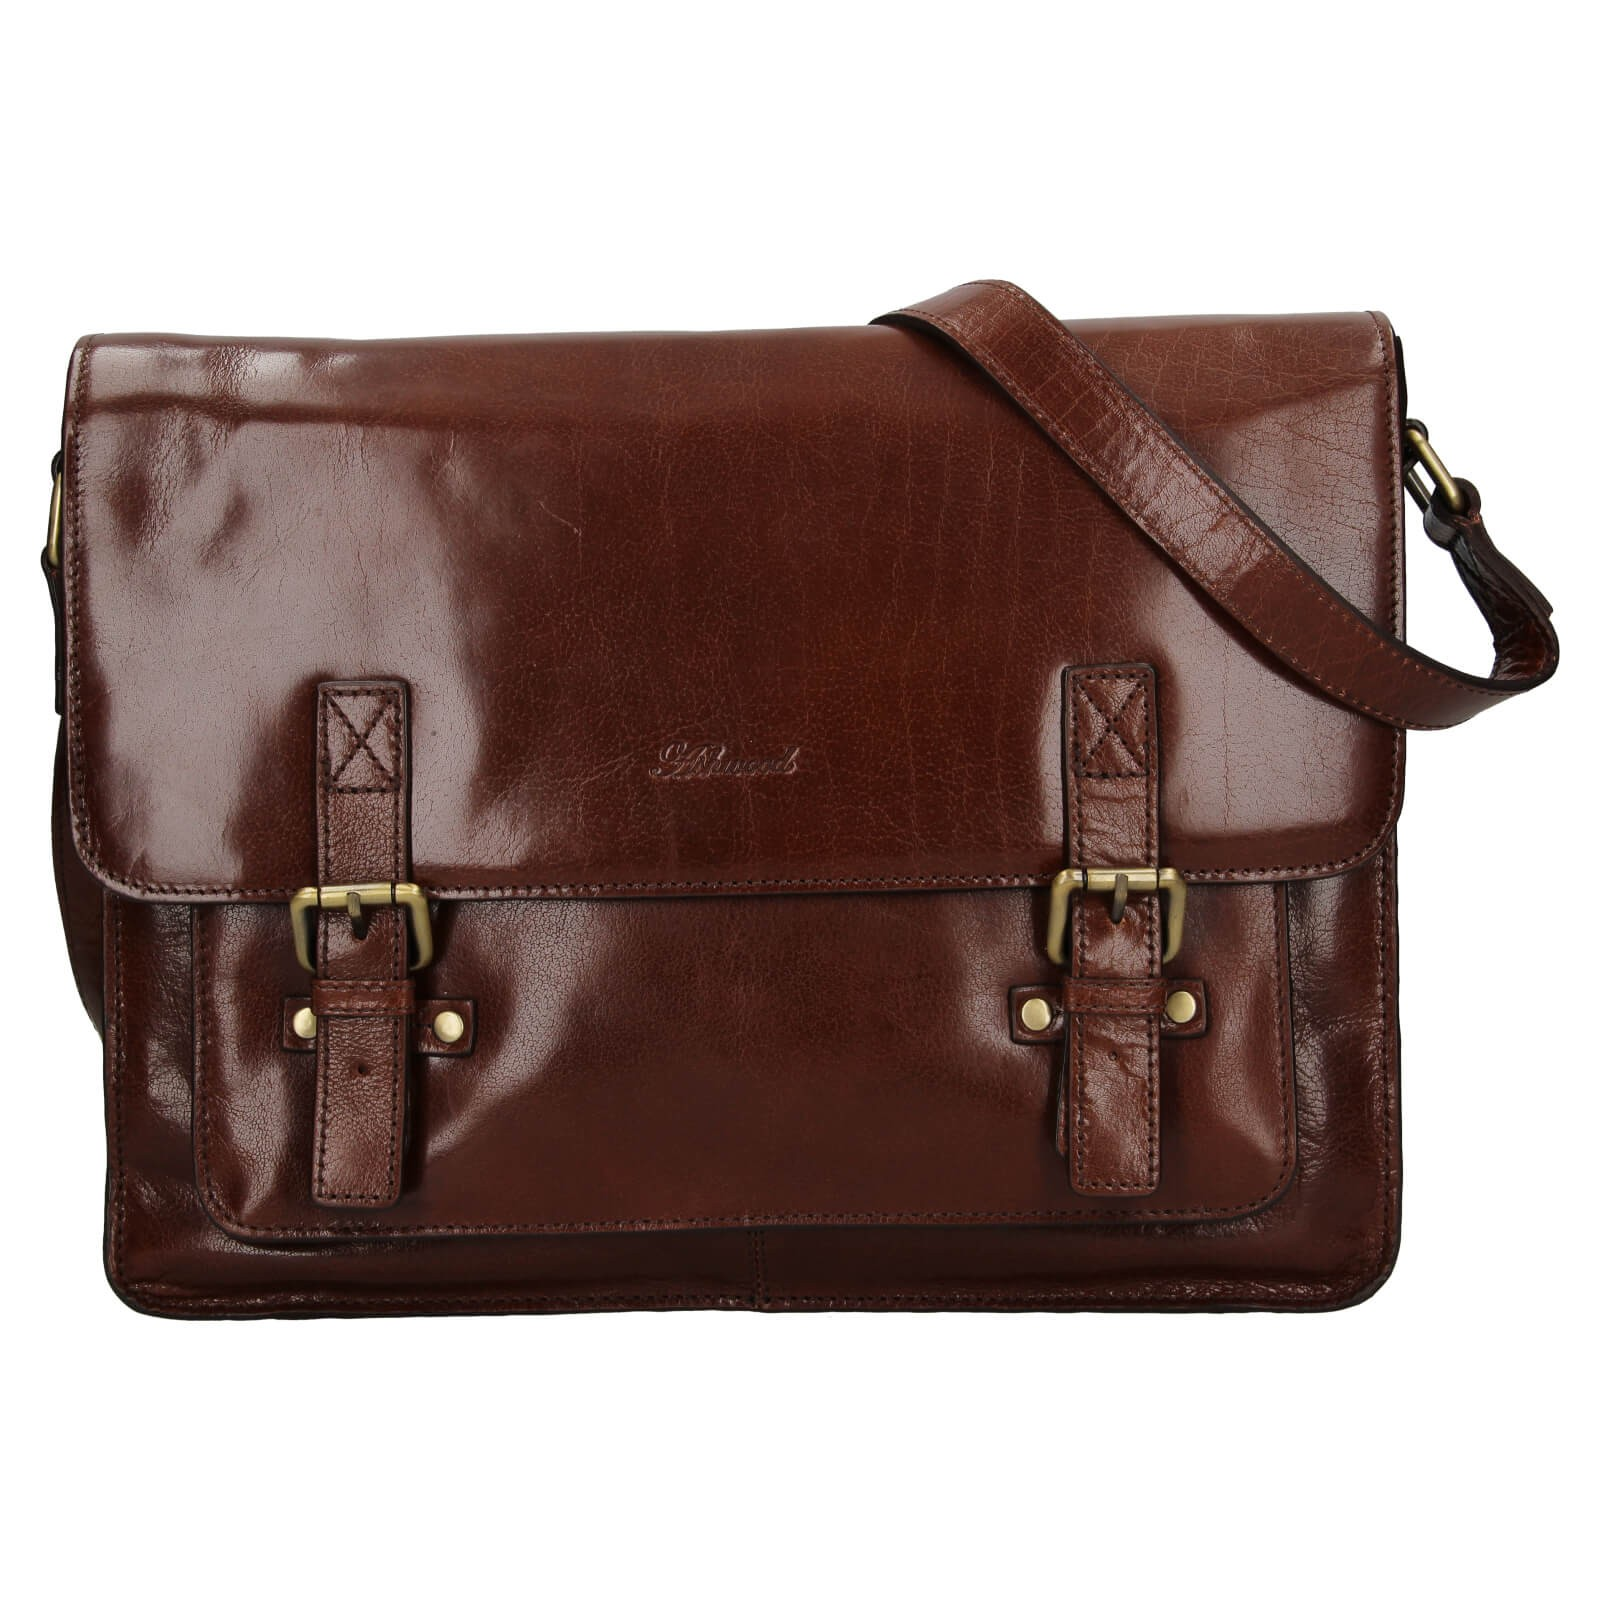 Pánska kožená taška cez rameno Ashwood Satls - koňak